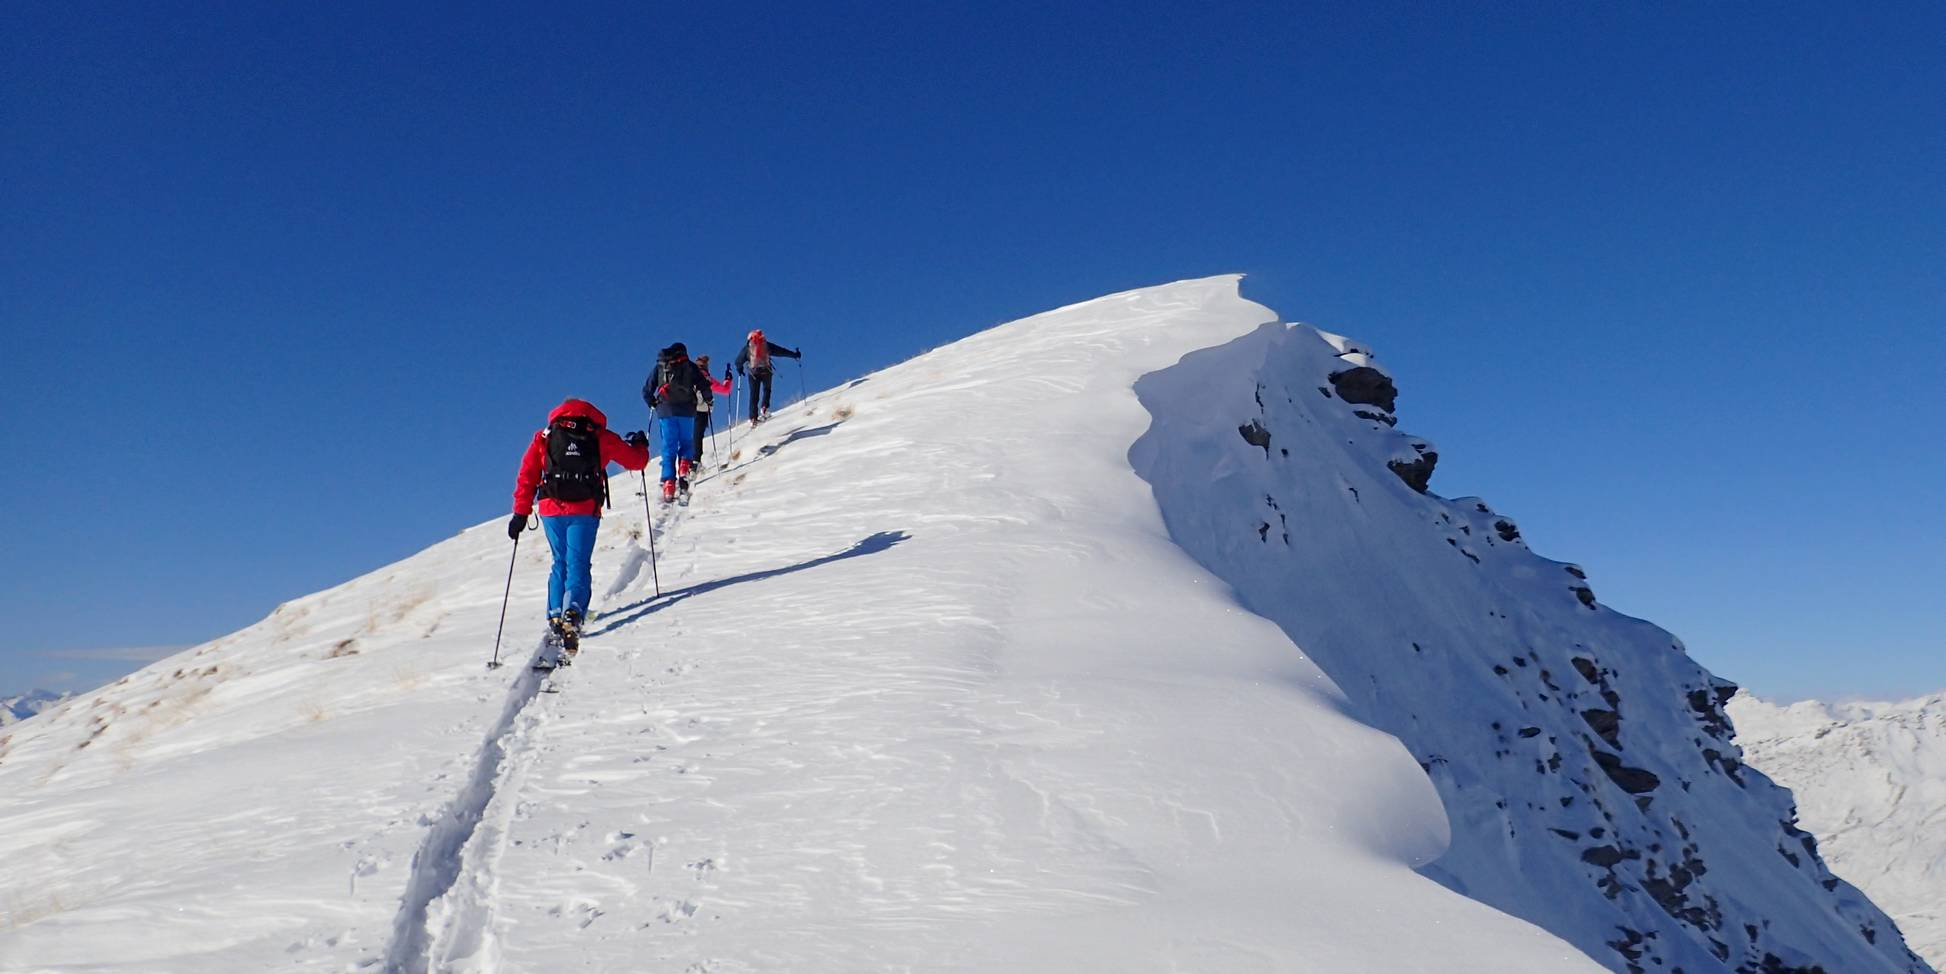 Séjours de decouverte du ski de rando